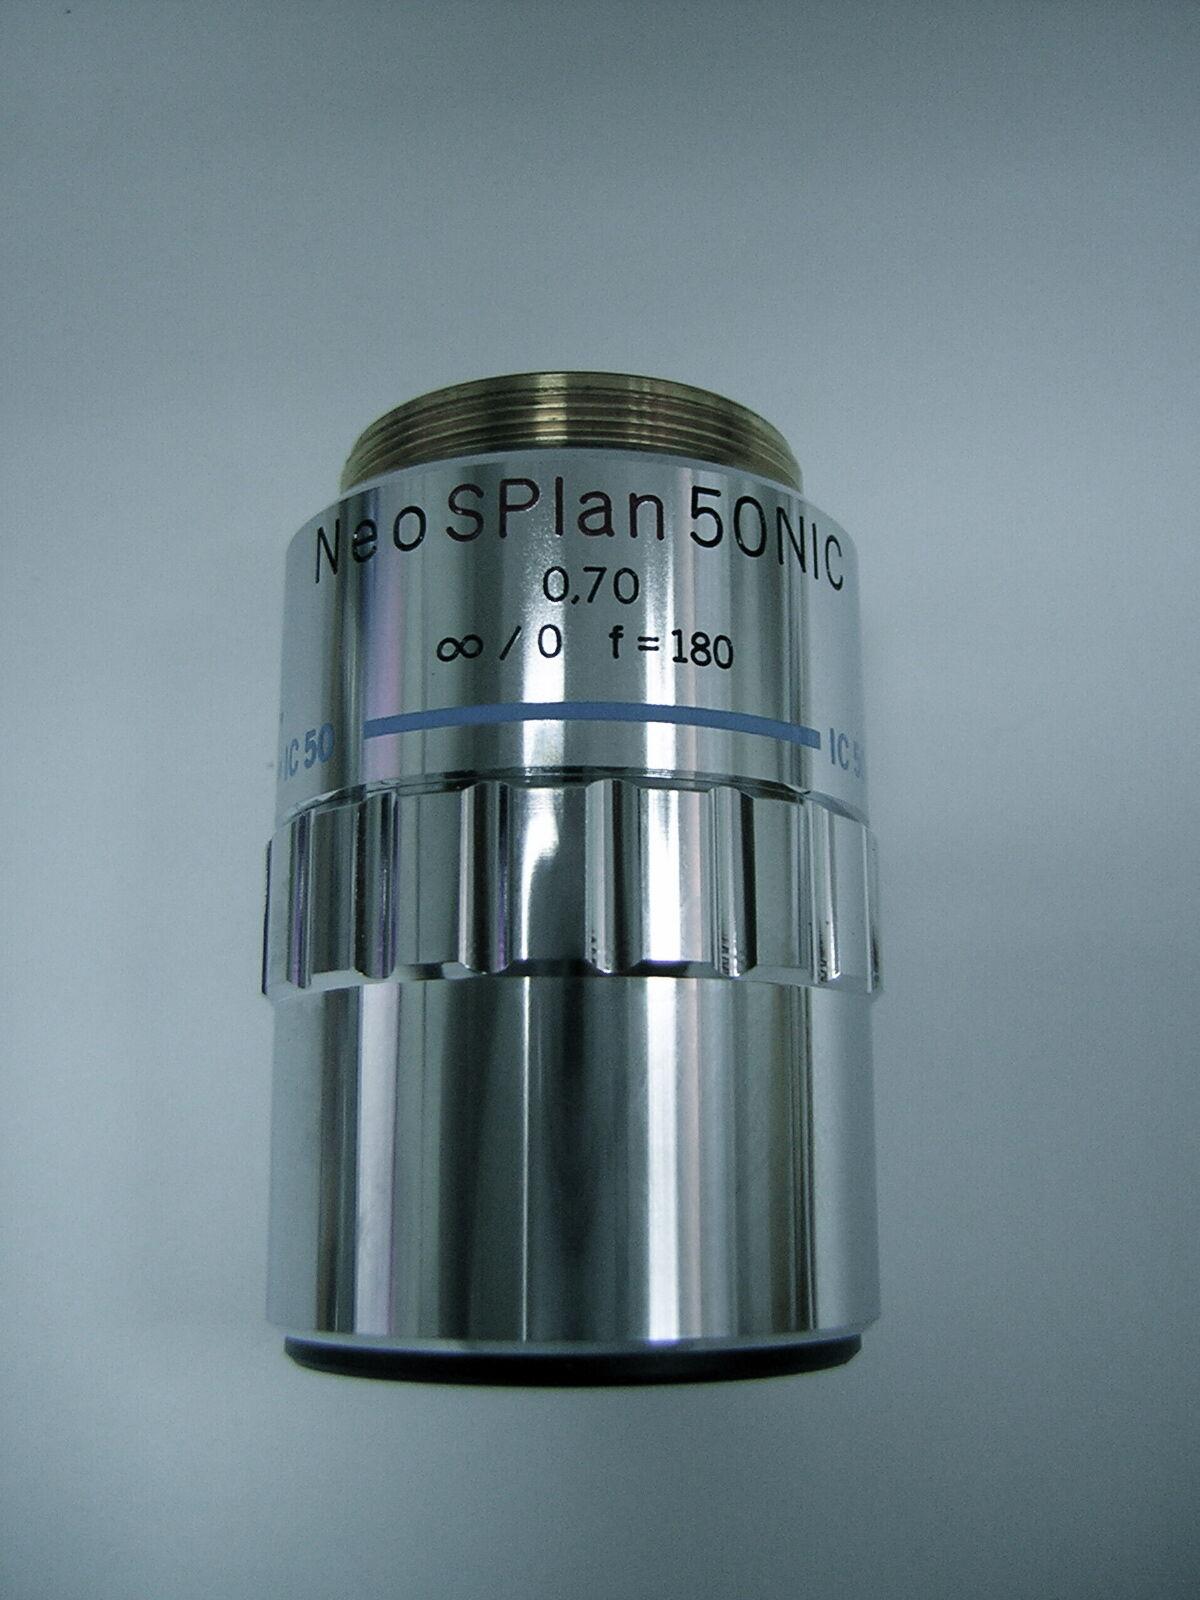 Olympus Microscope Objective Neo SPlan 50 NIC 0.70 ∞ 0 f=180 IC 50